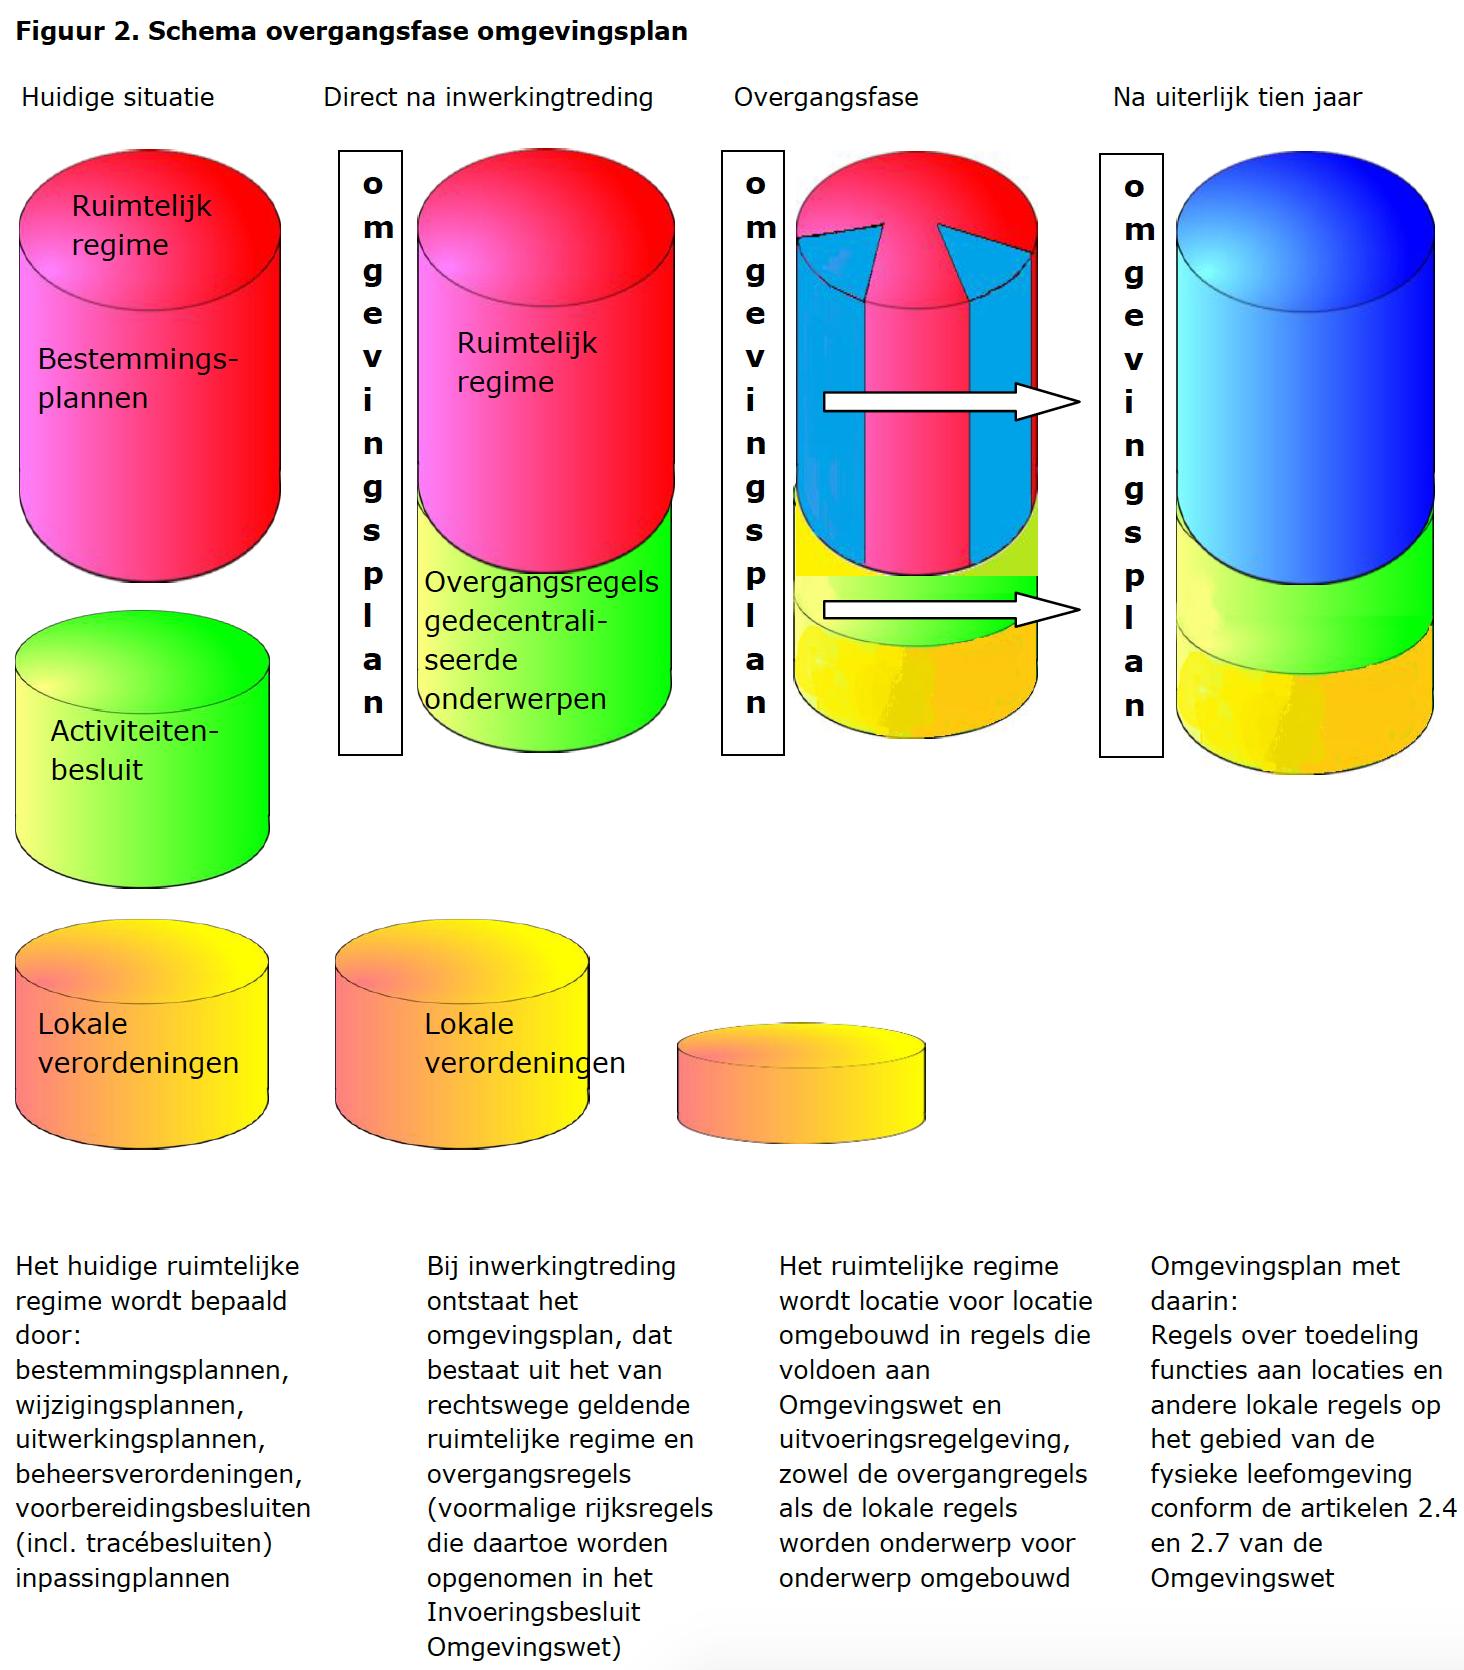 schema-overgangsfase-omgevingsplan